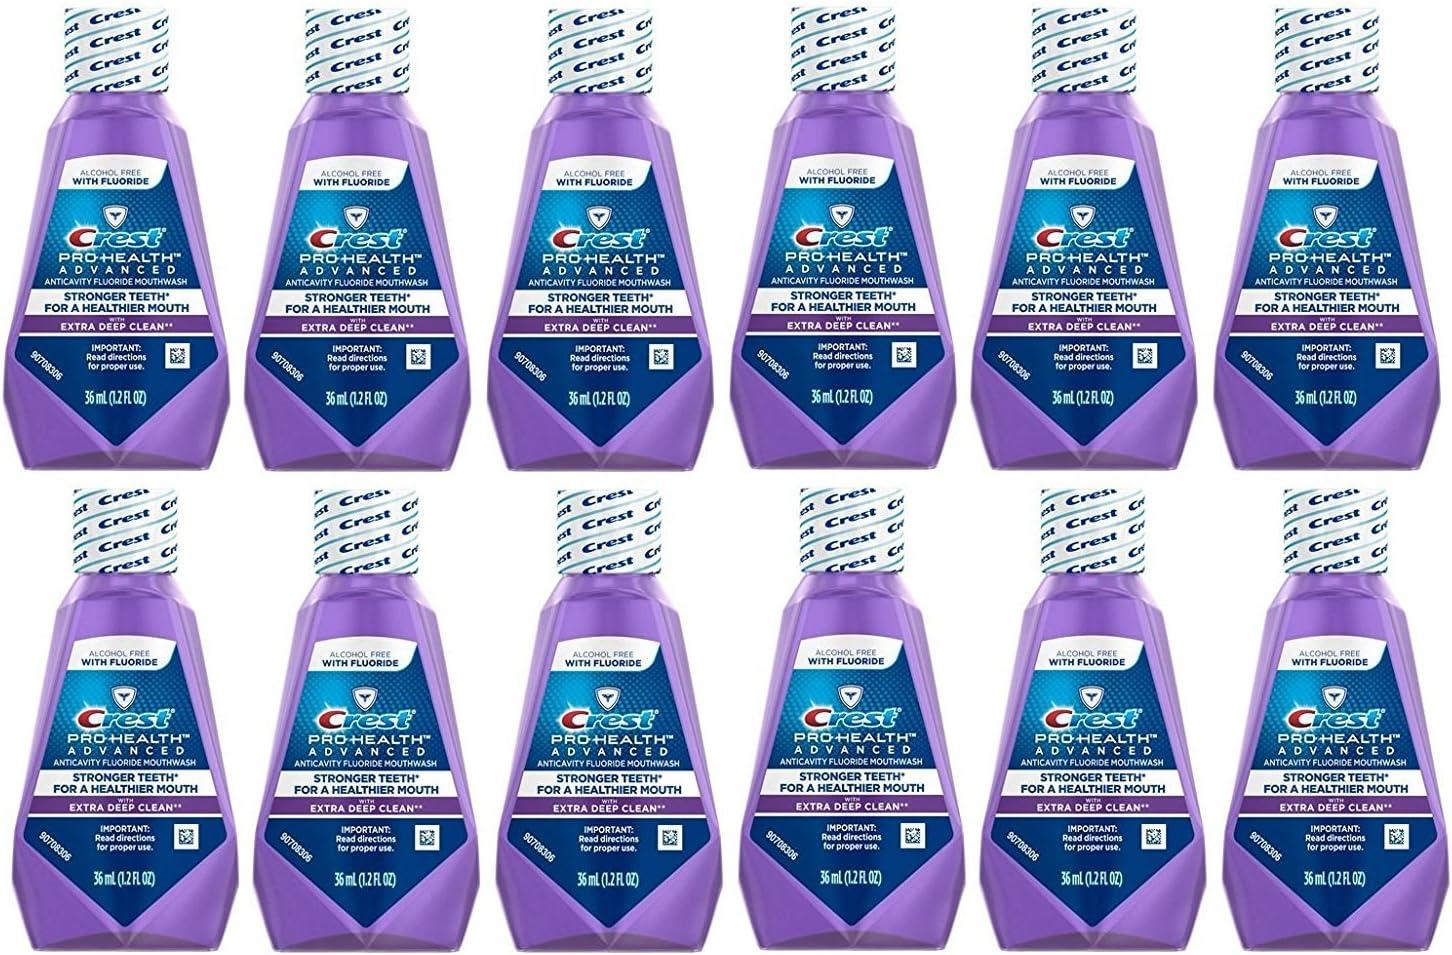 Crest Pro-Health Advanced Anticavity Fluoride Mouthwash/Rinse, Alcohol Free, Travel Size 36 ml (1.2 fl oz) - 12 Pack